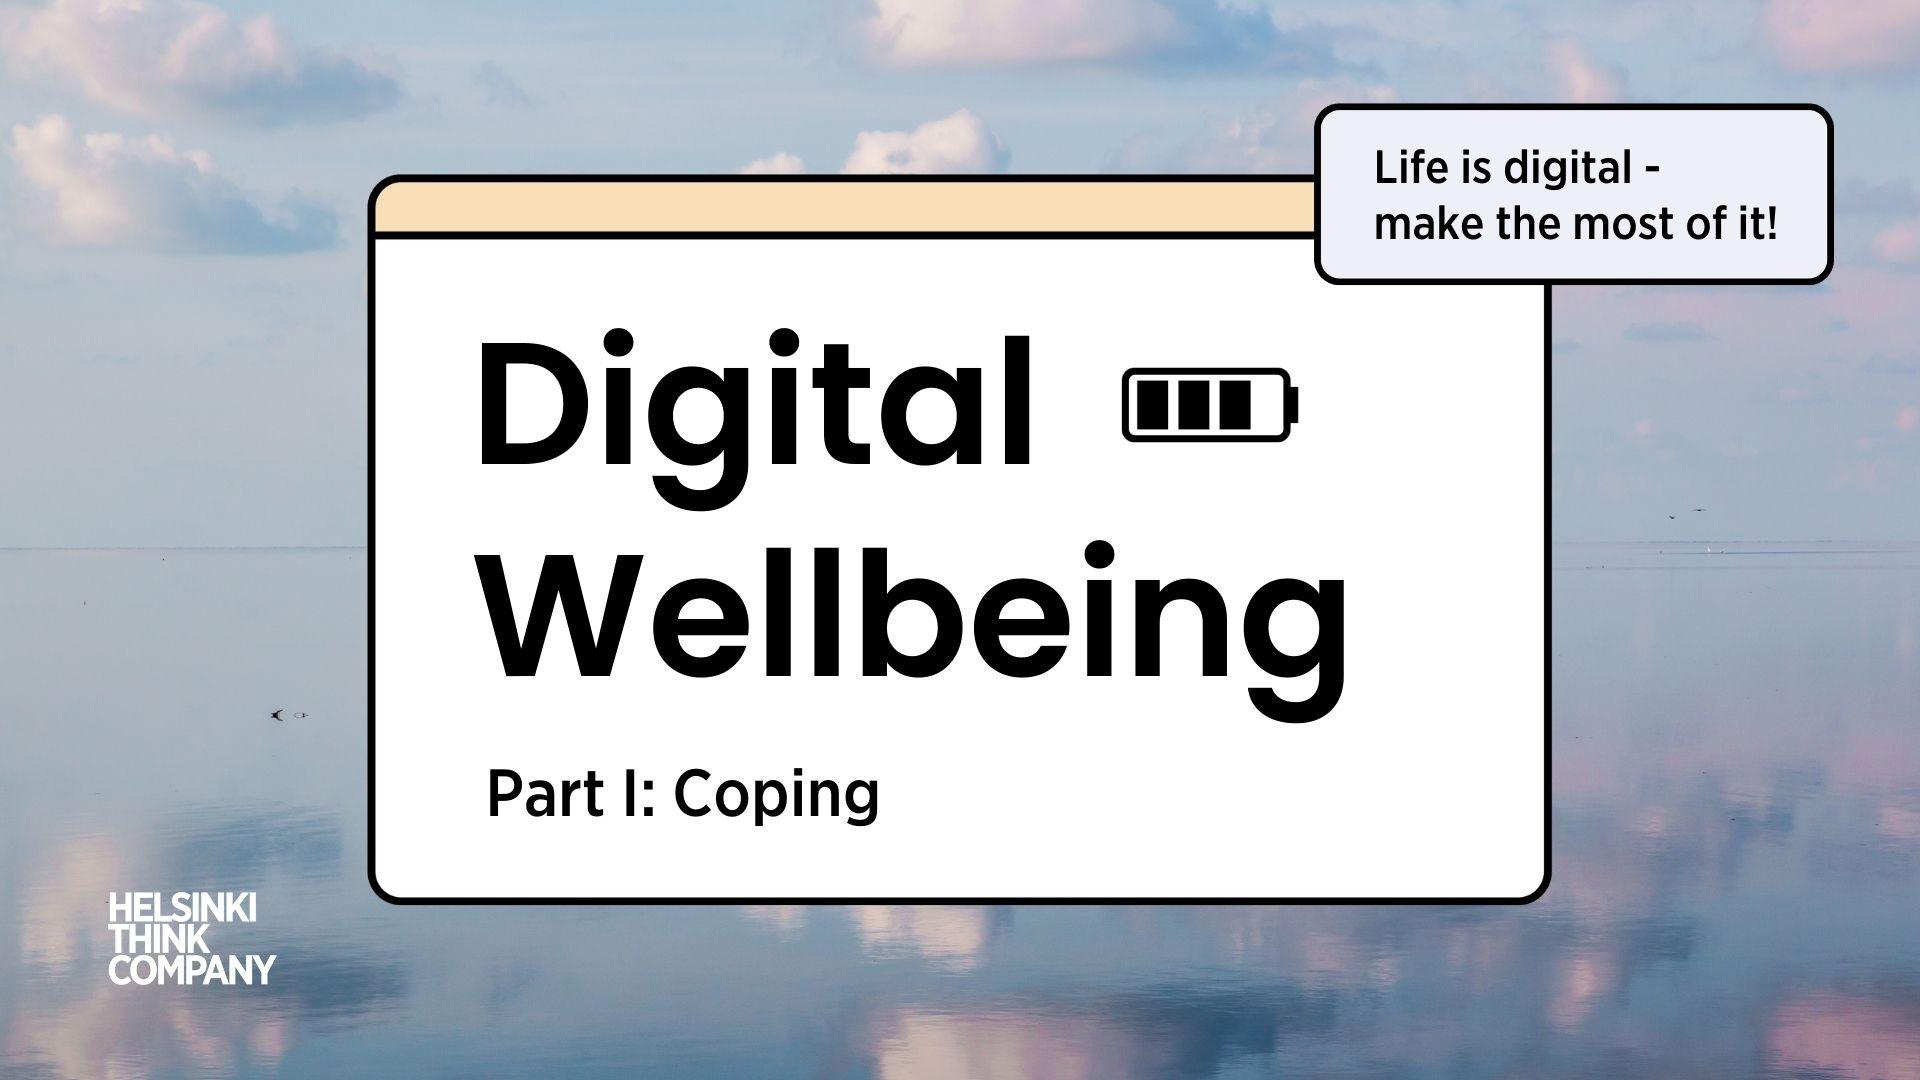 Digital wellbeing event series part 1